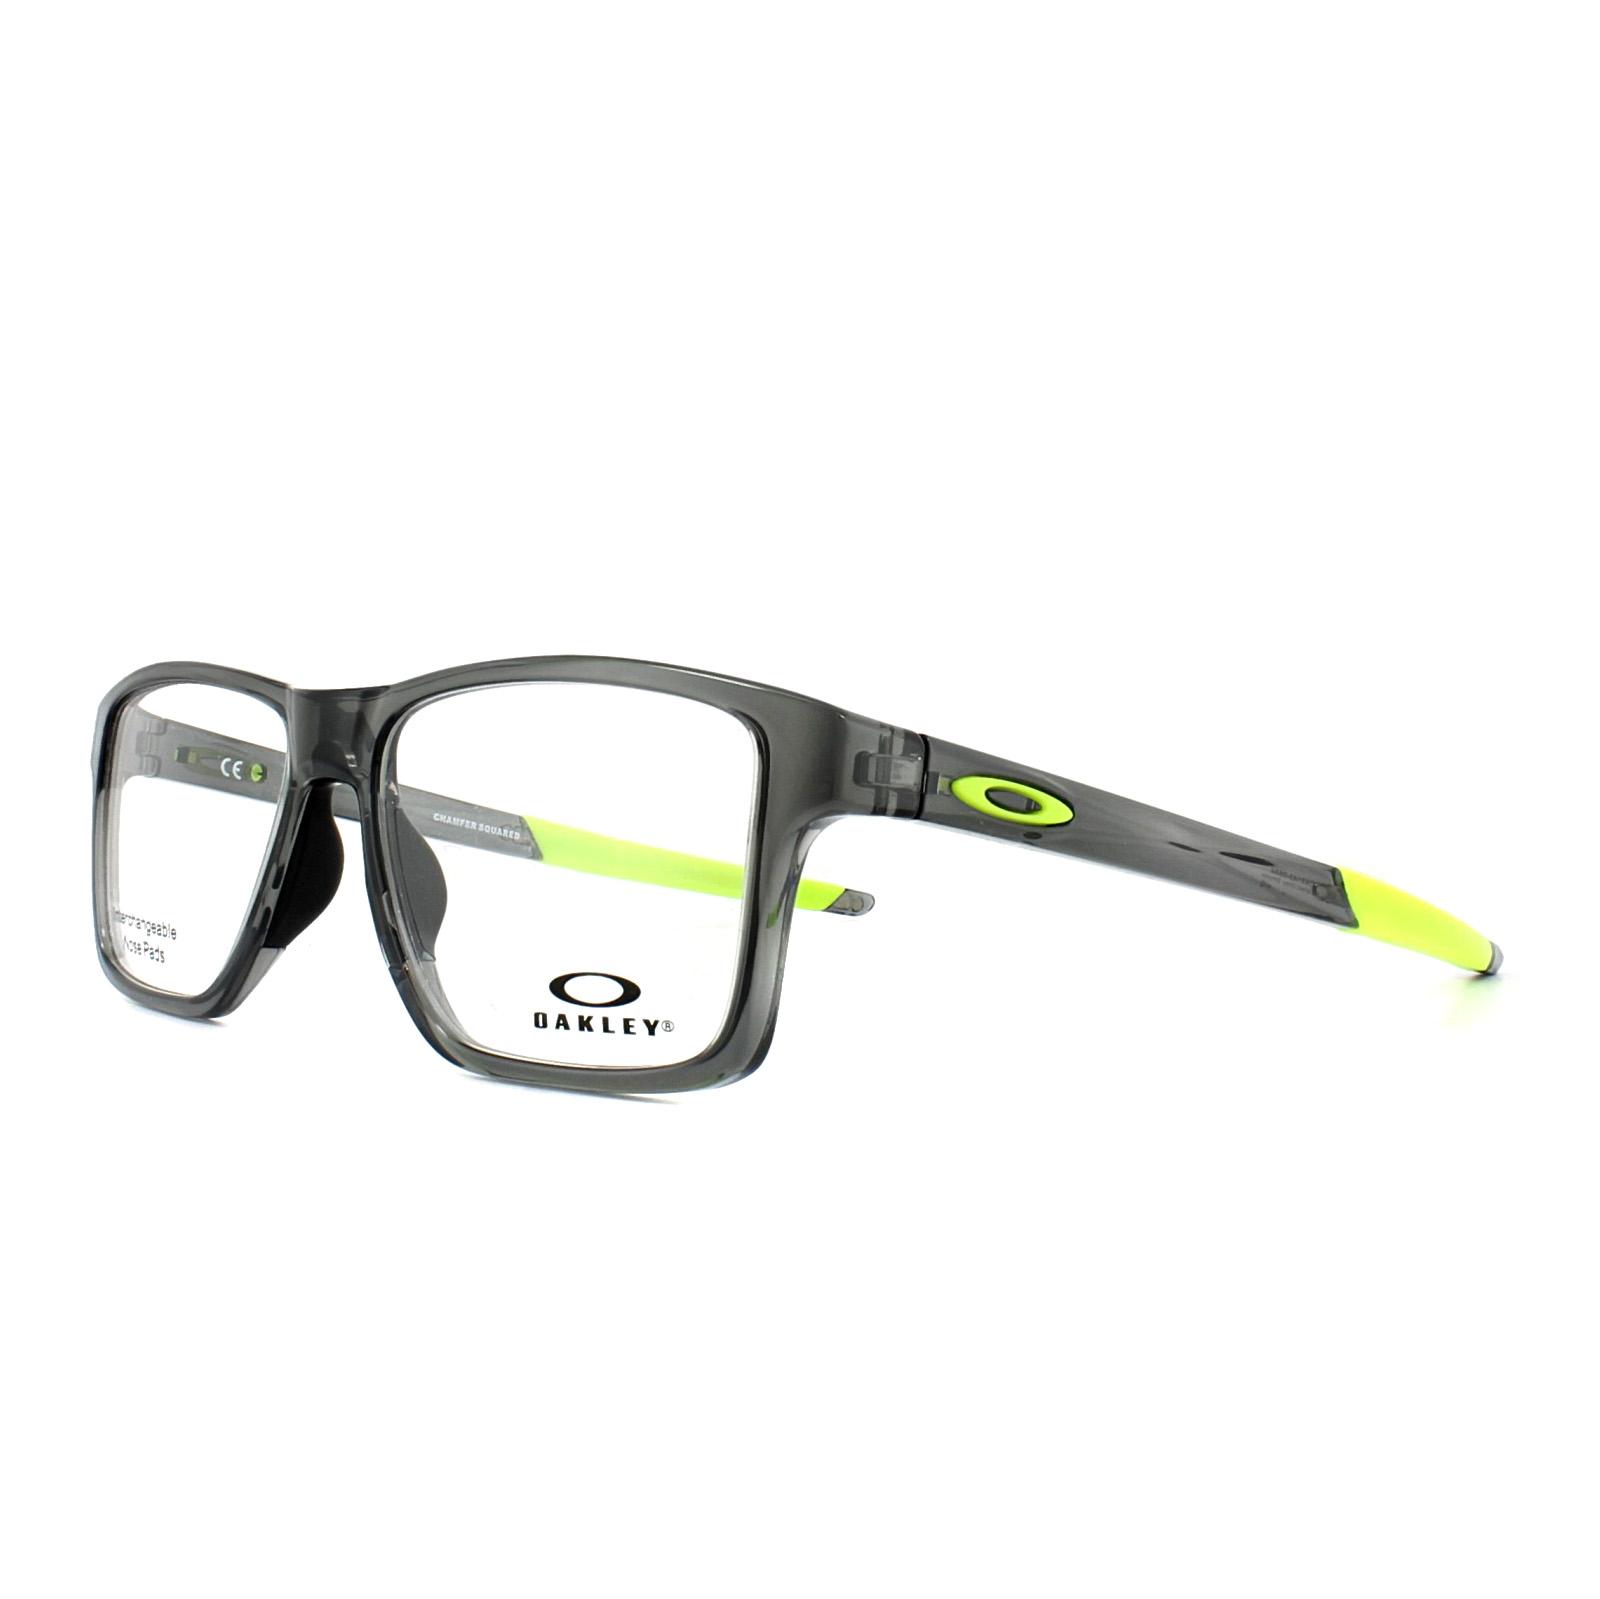 a82b87b6ae Sentinel Oakley Glasses Frames Chamfer Squared OX8143-06 Polished Grey  Smoke 54mm Mens